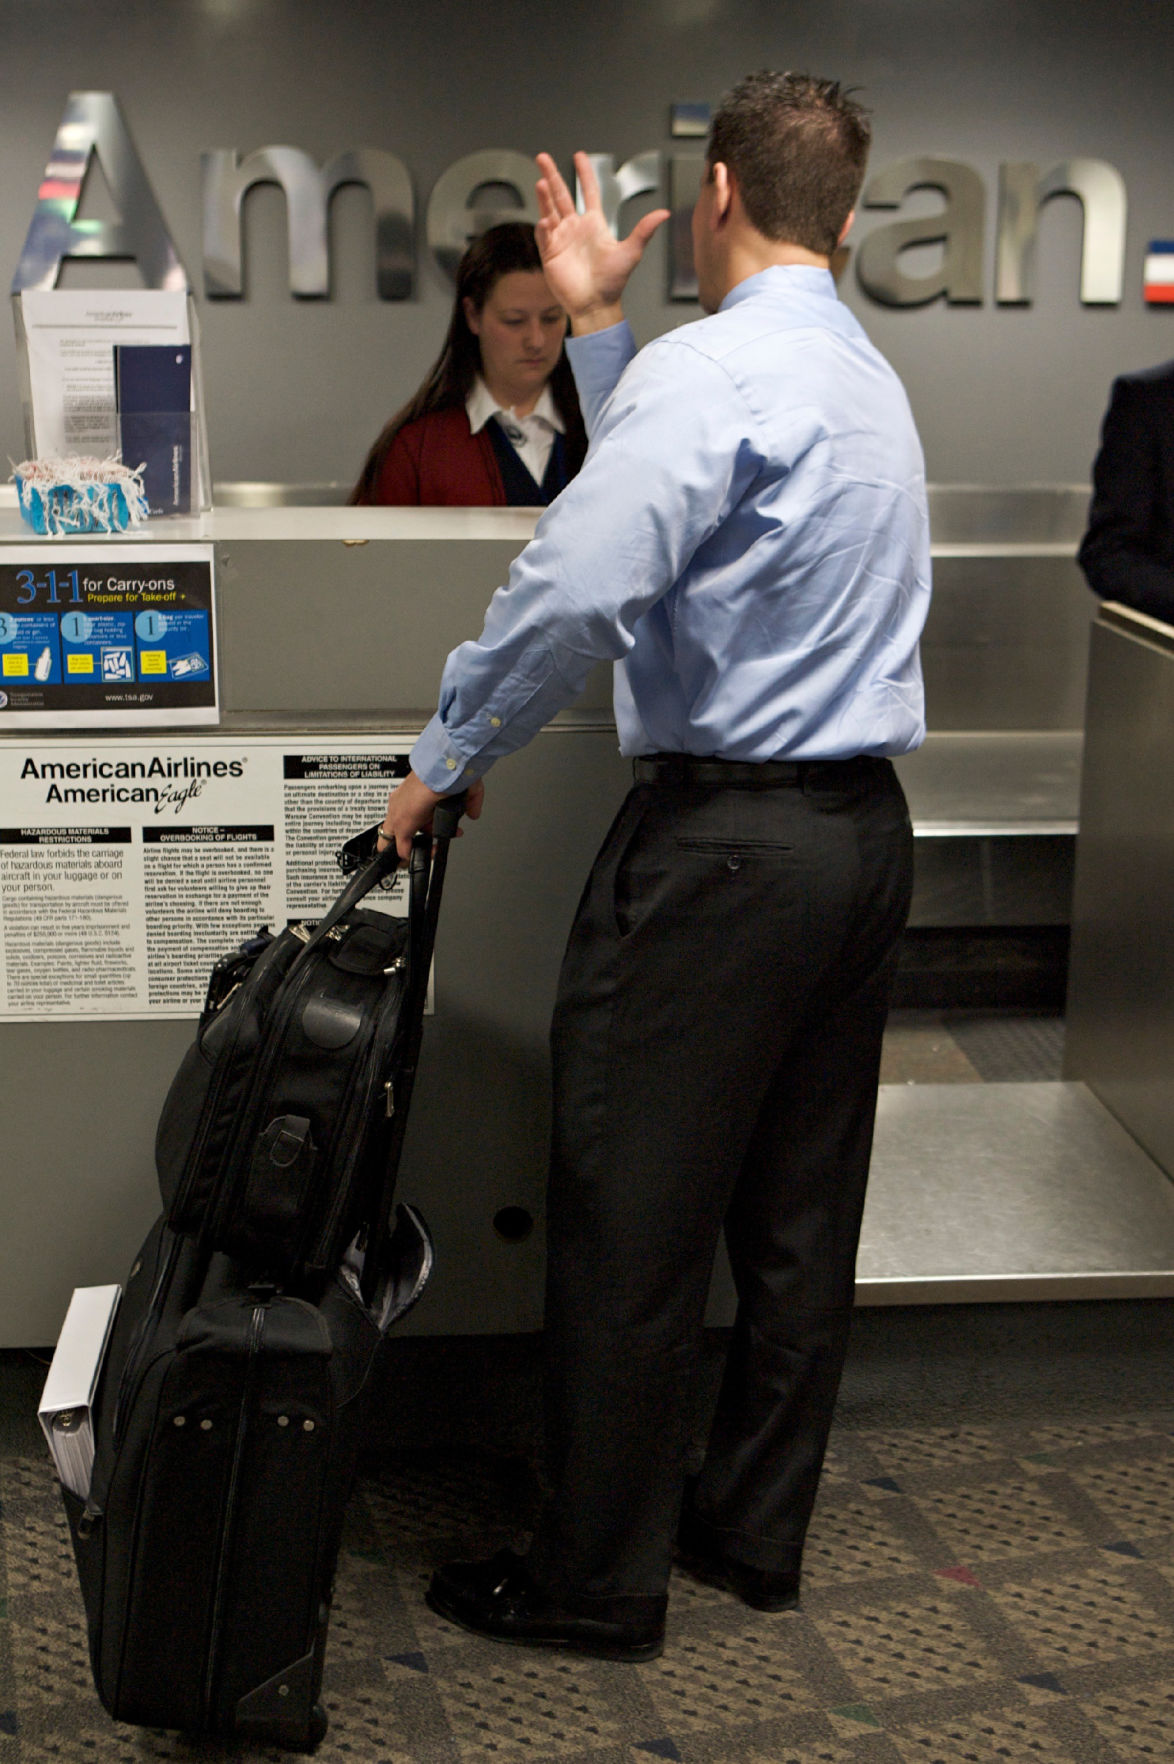 Economic uncertainty hurts business travel